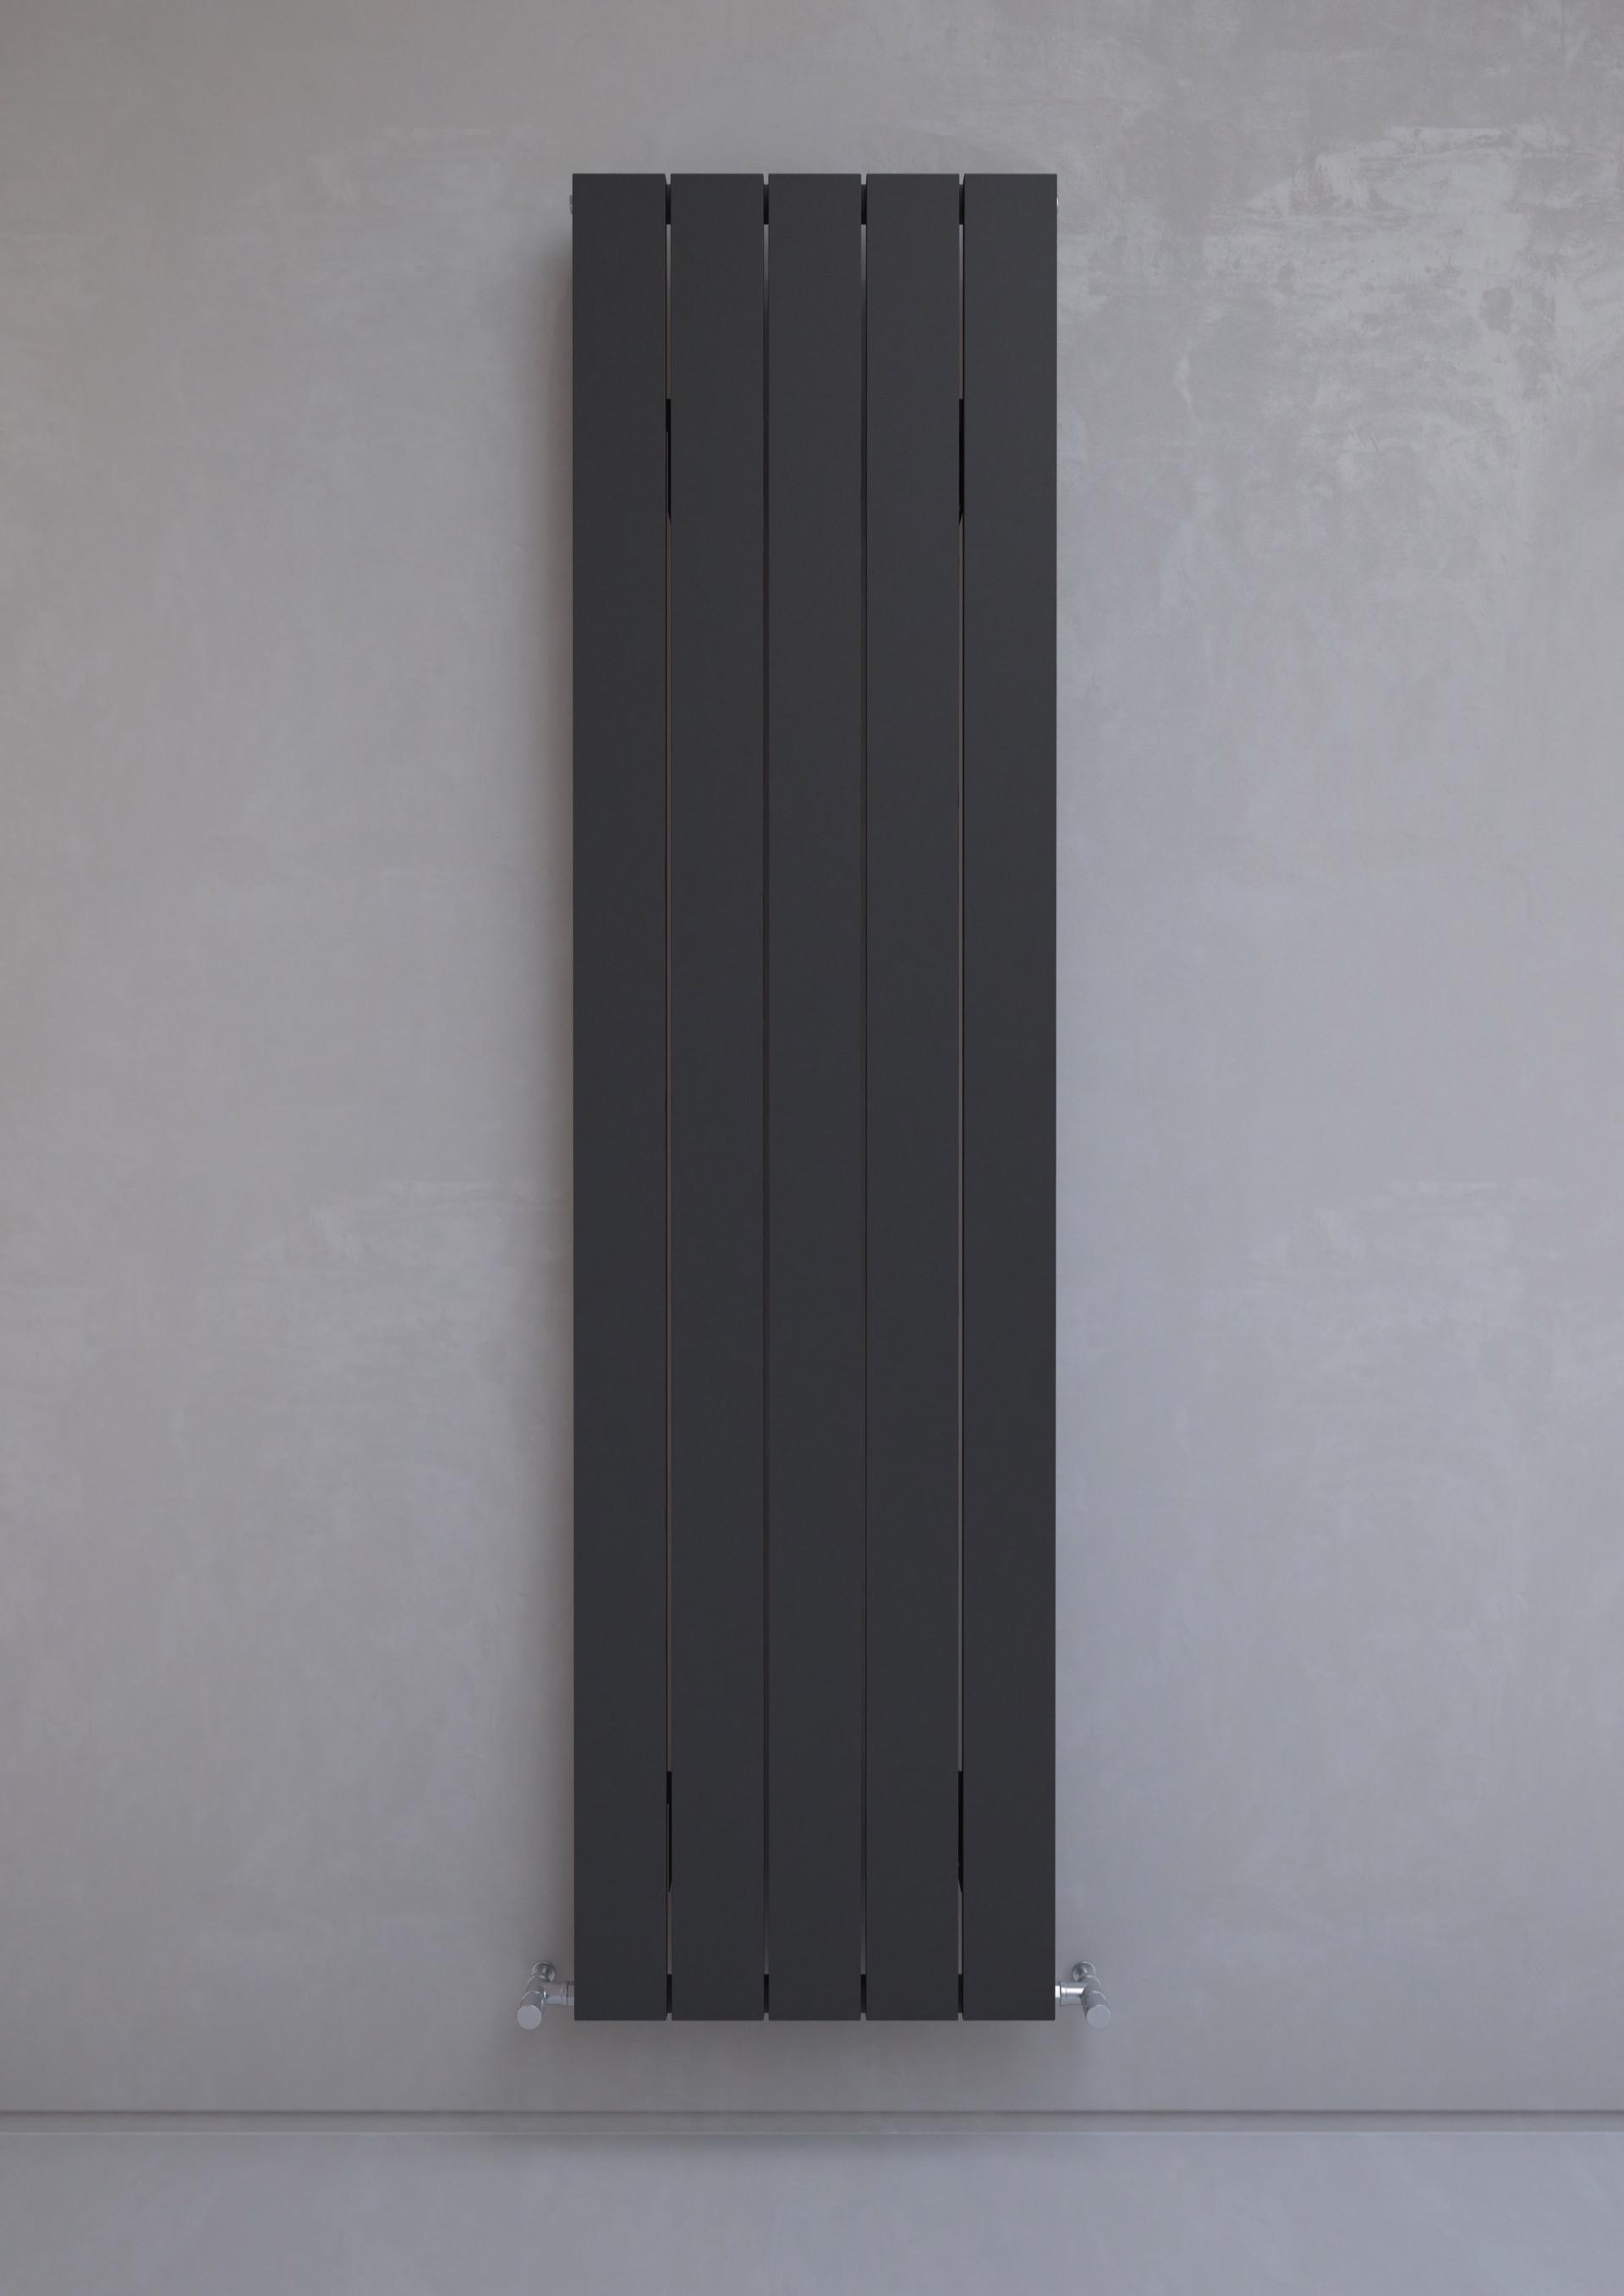 Kudox Alulite Radiator Flat 1800mm X 470mm Textured Black